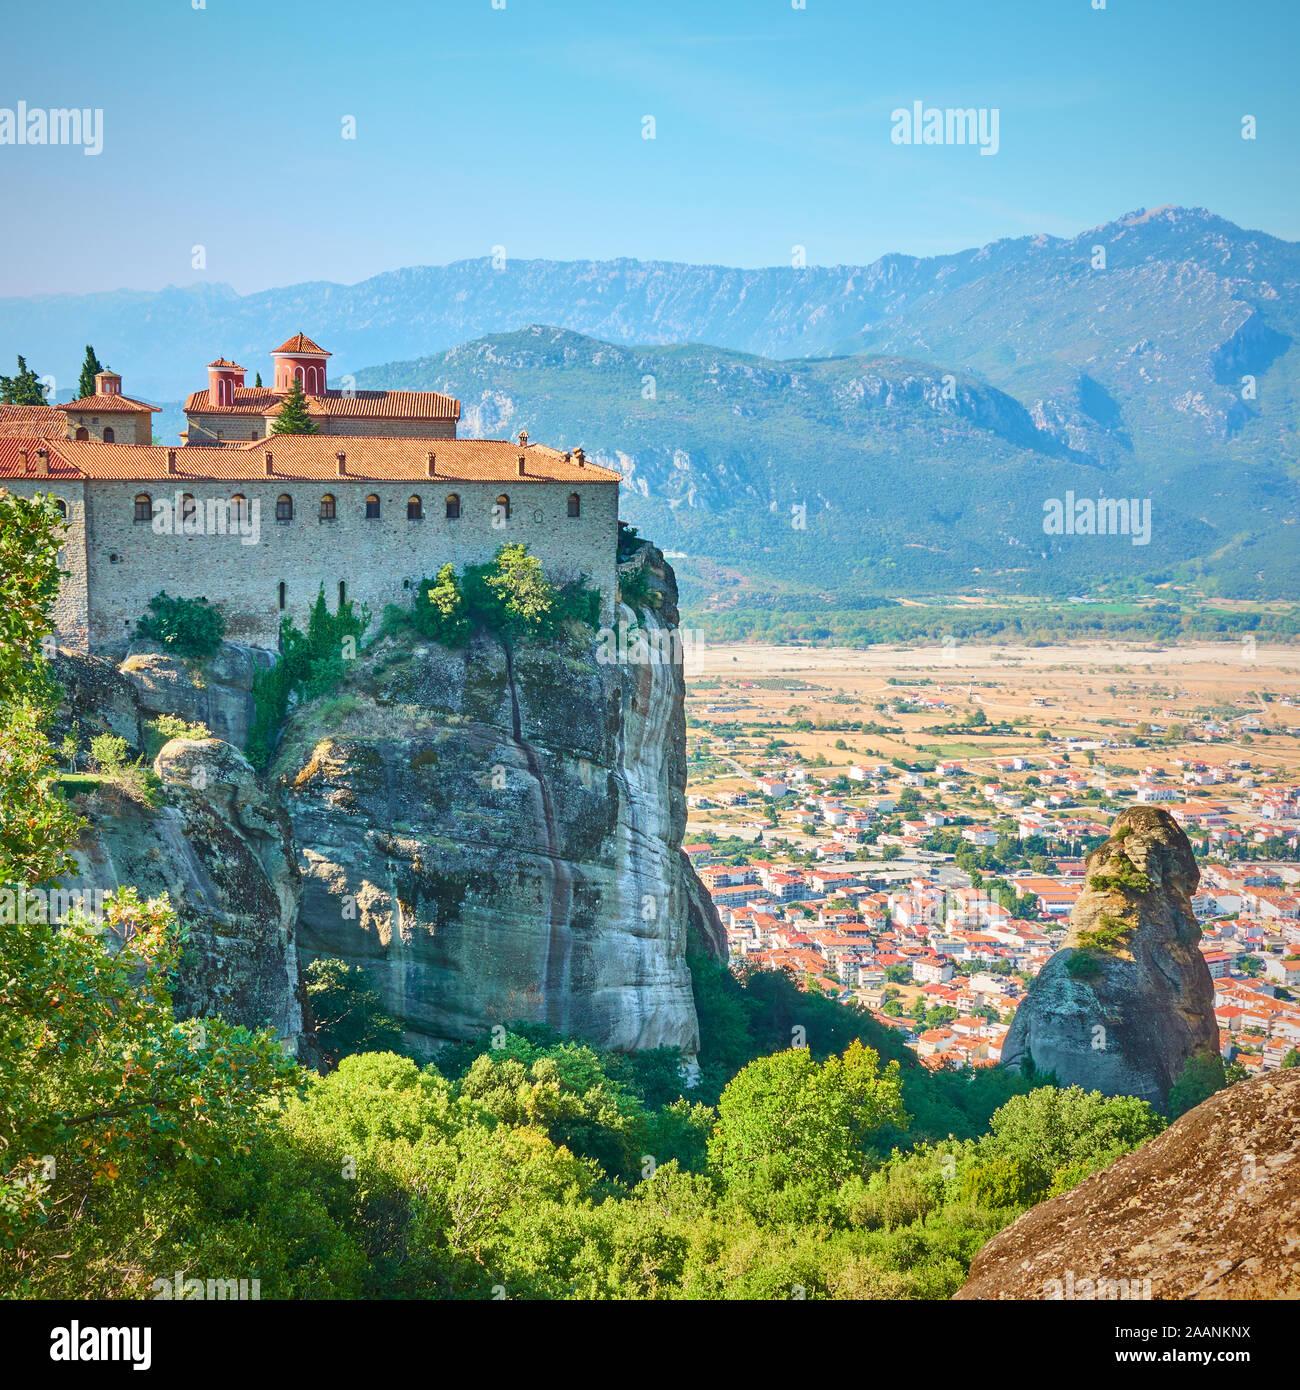 The Monastery of St. Stephen in Meteora, Greece - Greek landmark Stock Photo